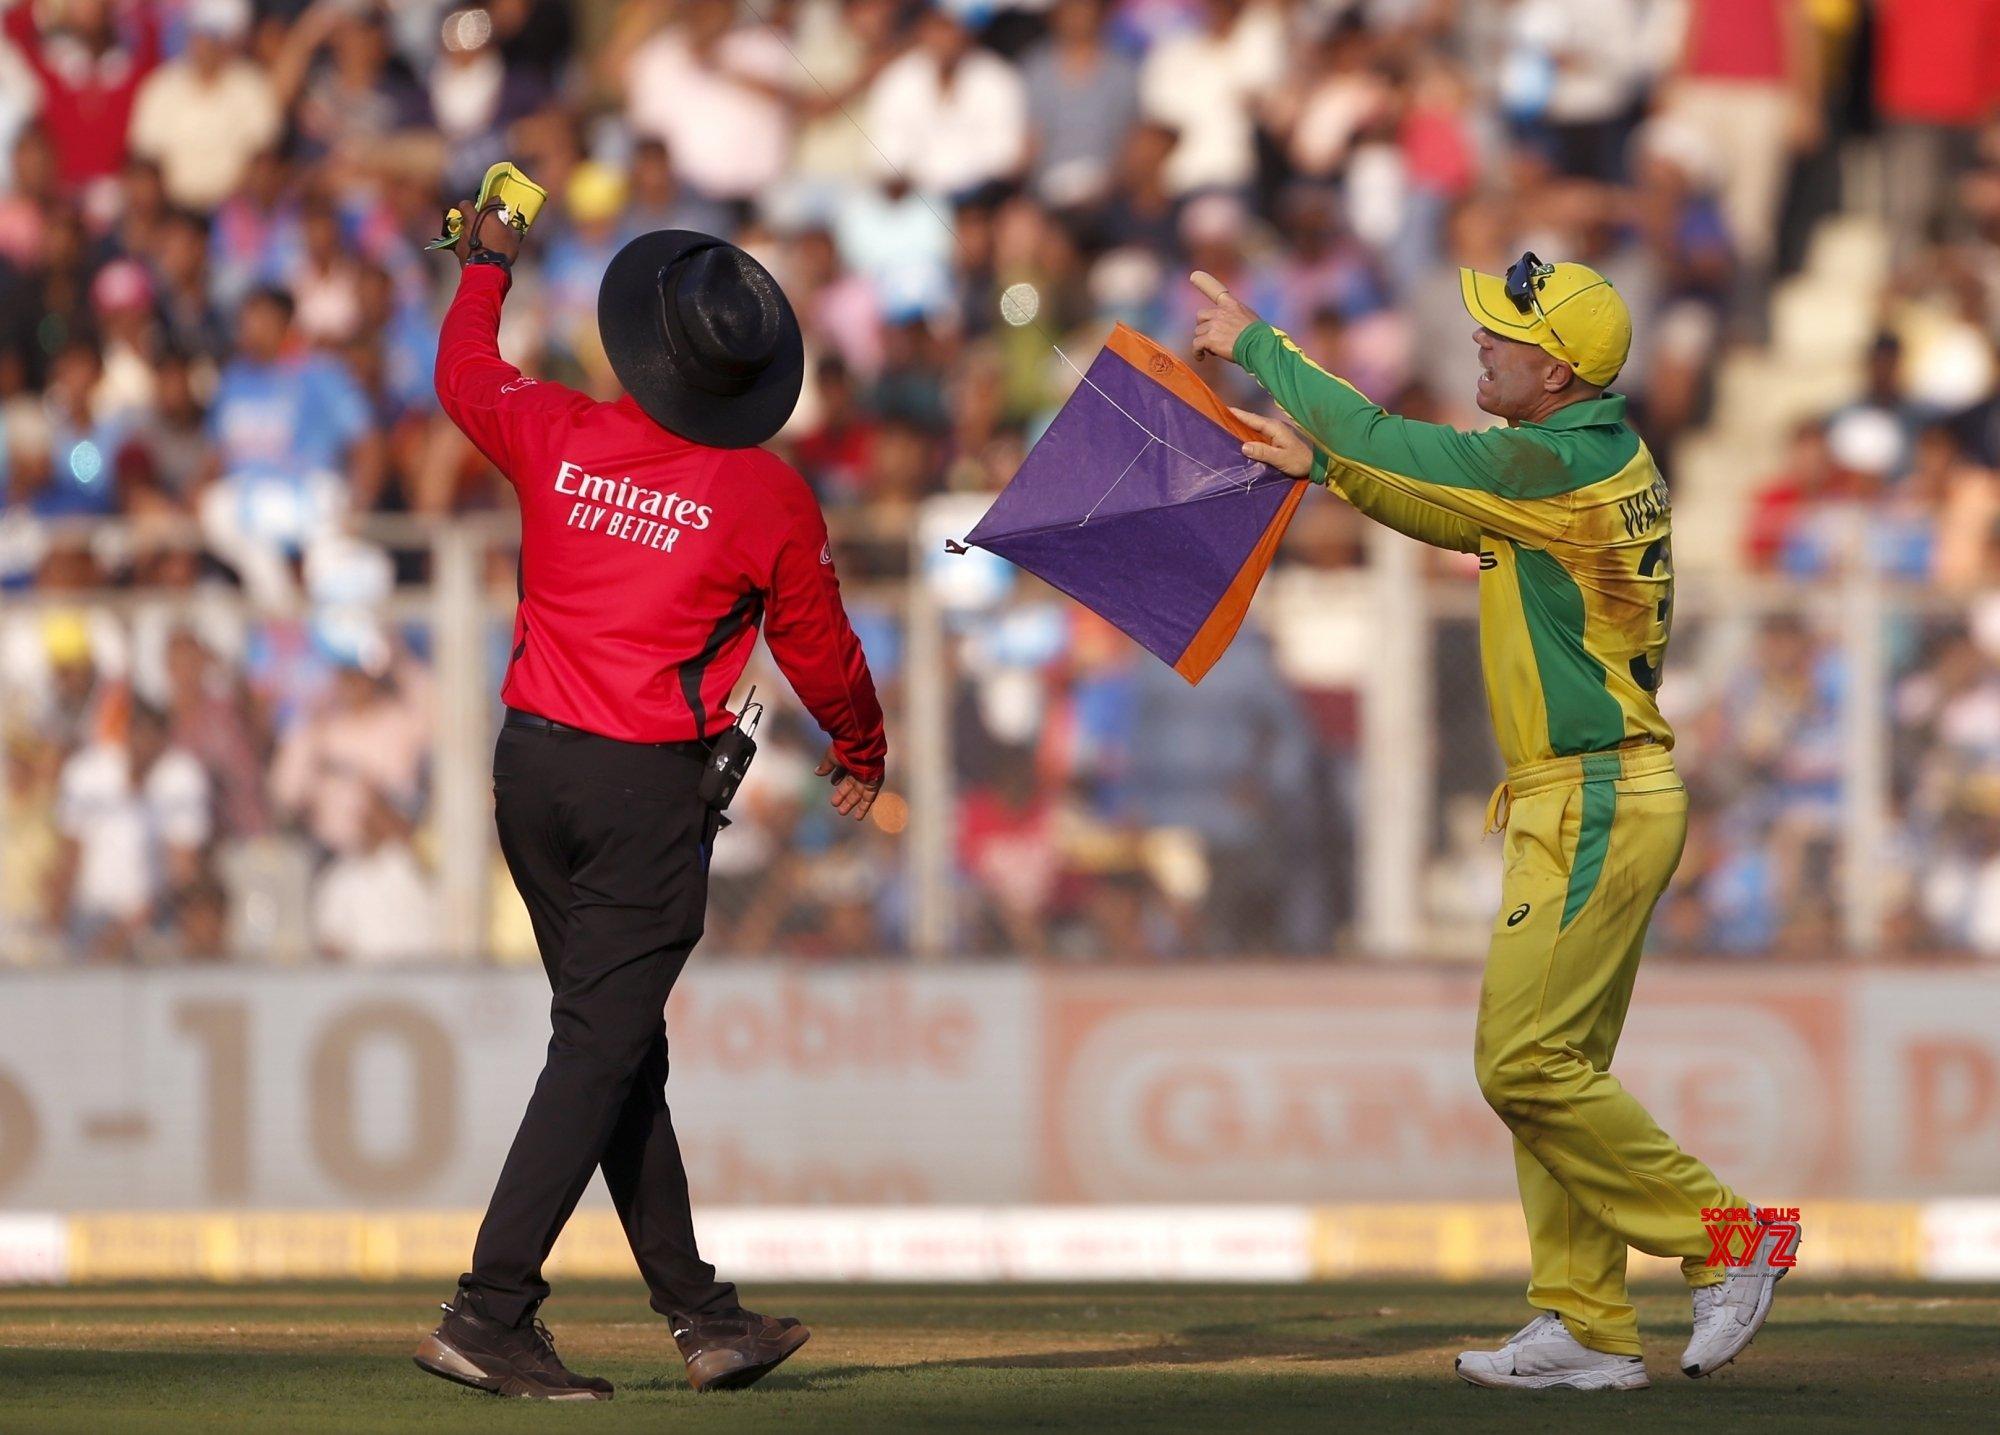 Mumbai: 1st ODI - India Vs Australia (Batch - 27) #Gallery